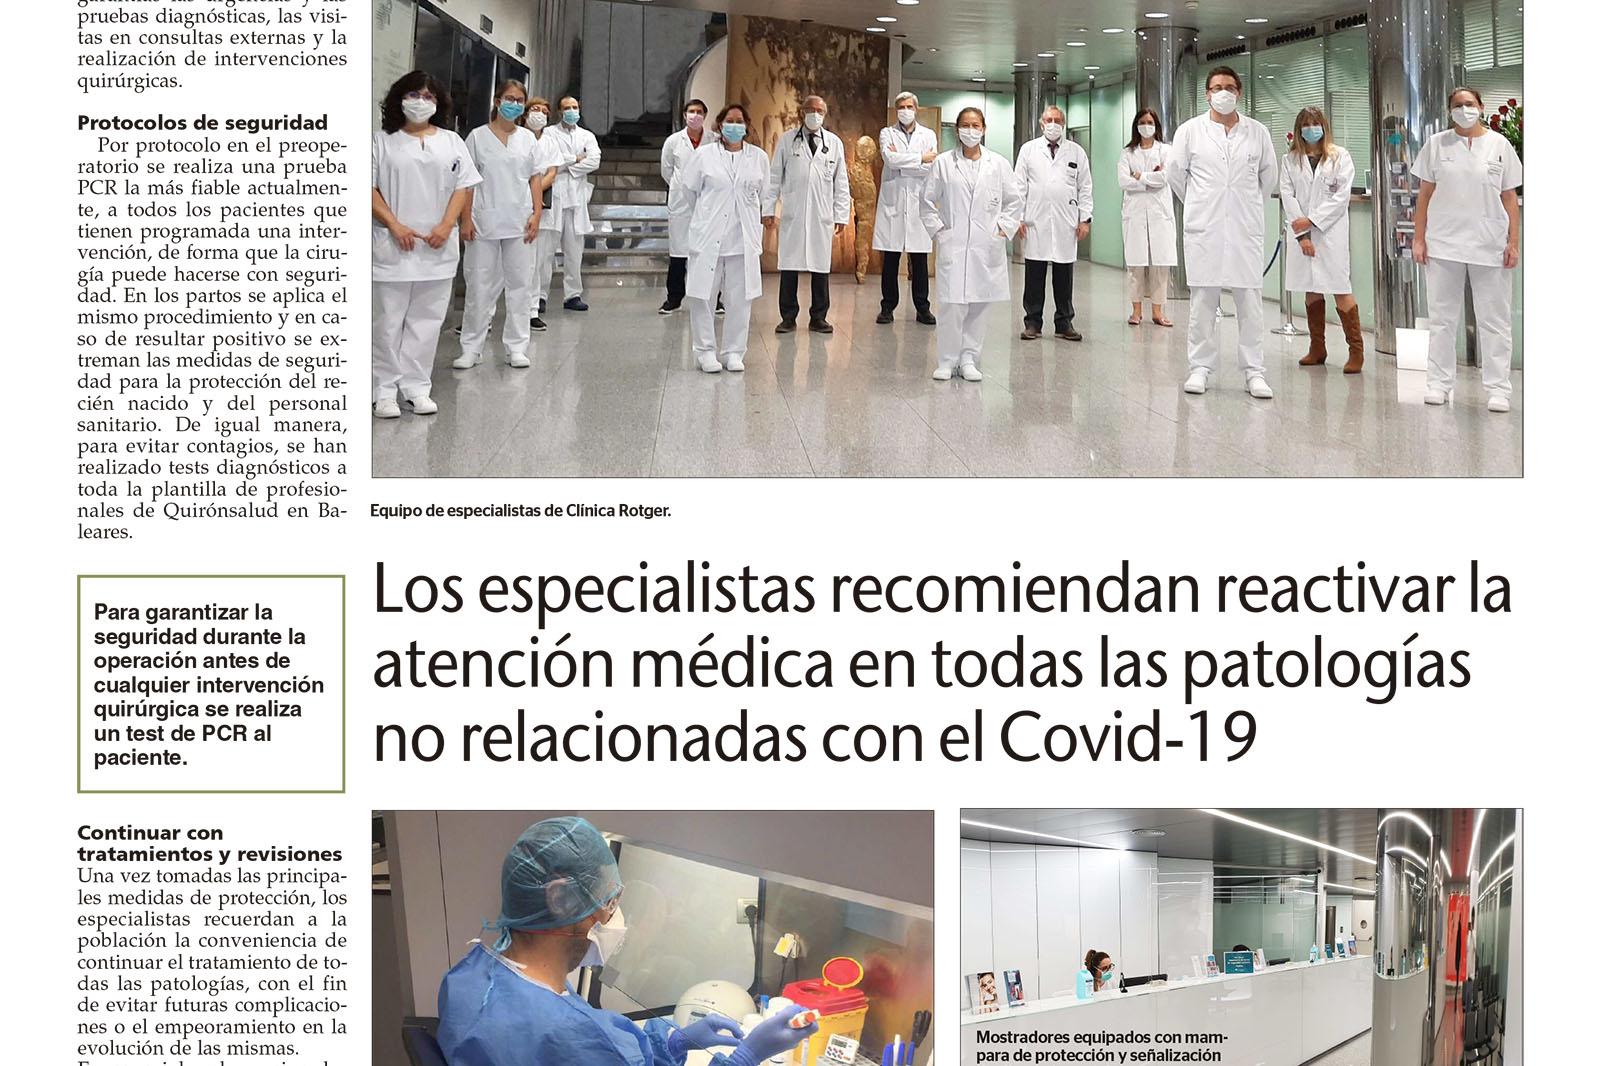 Atención Médica. Ultima-Hora-Activacion Sanitaria-Clinica-Rotger-Hospital-Quironsalud-Palmaplanas